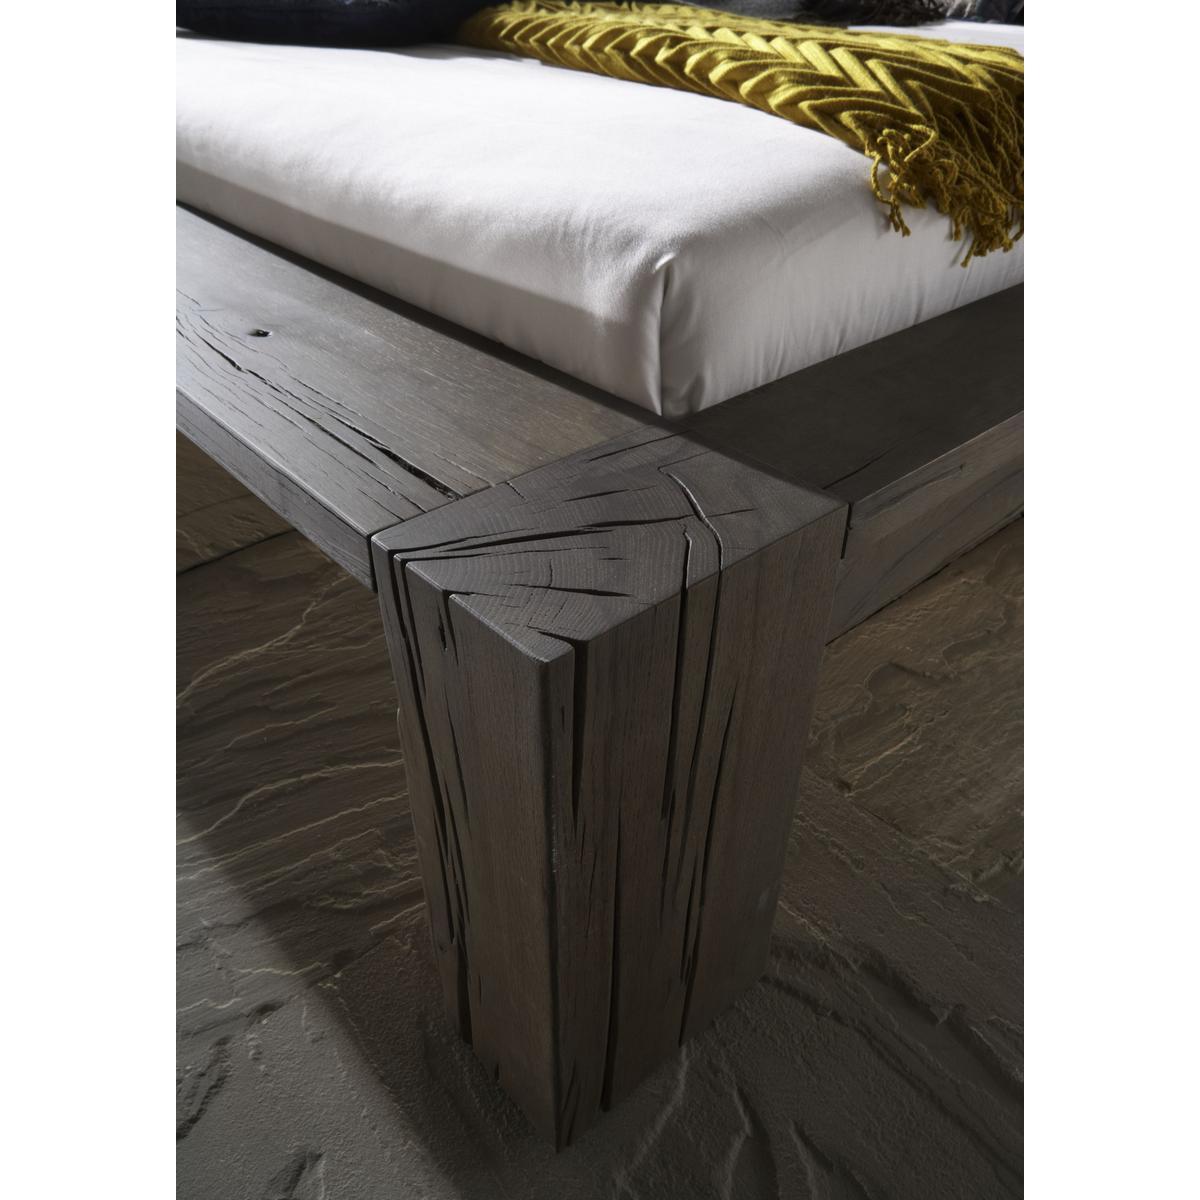 echtholz balkenbett 140x200 heavy sleep capri wildeiche. Black Bedroom Furniture Sets. Home Design Ideas